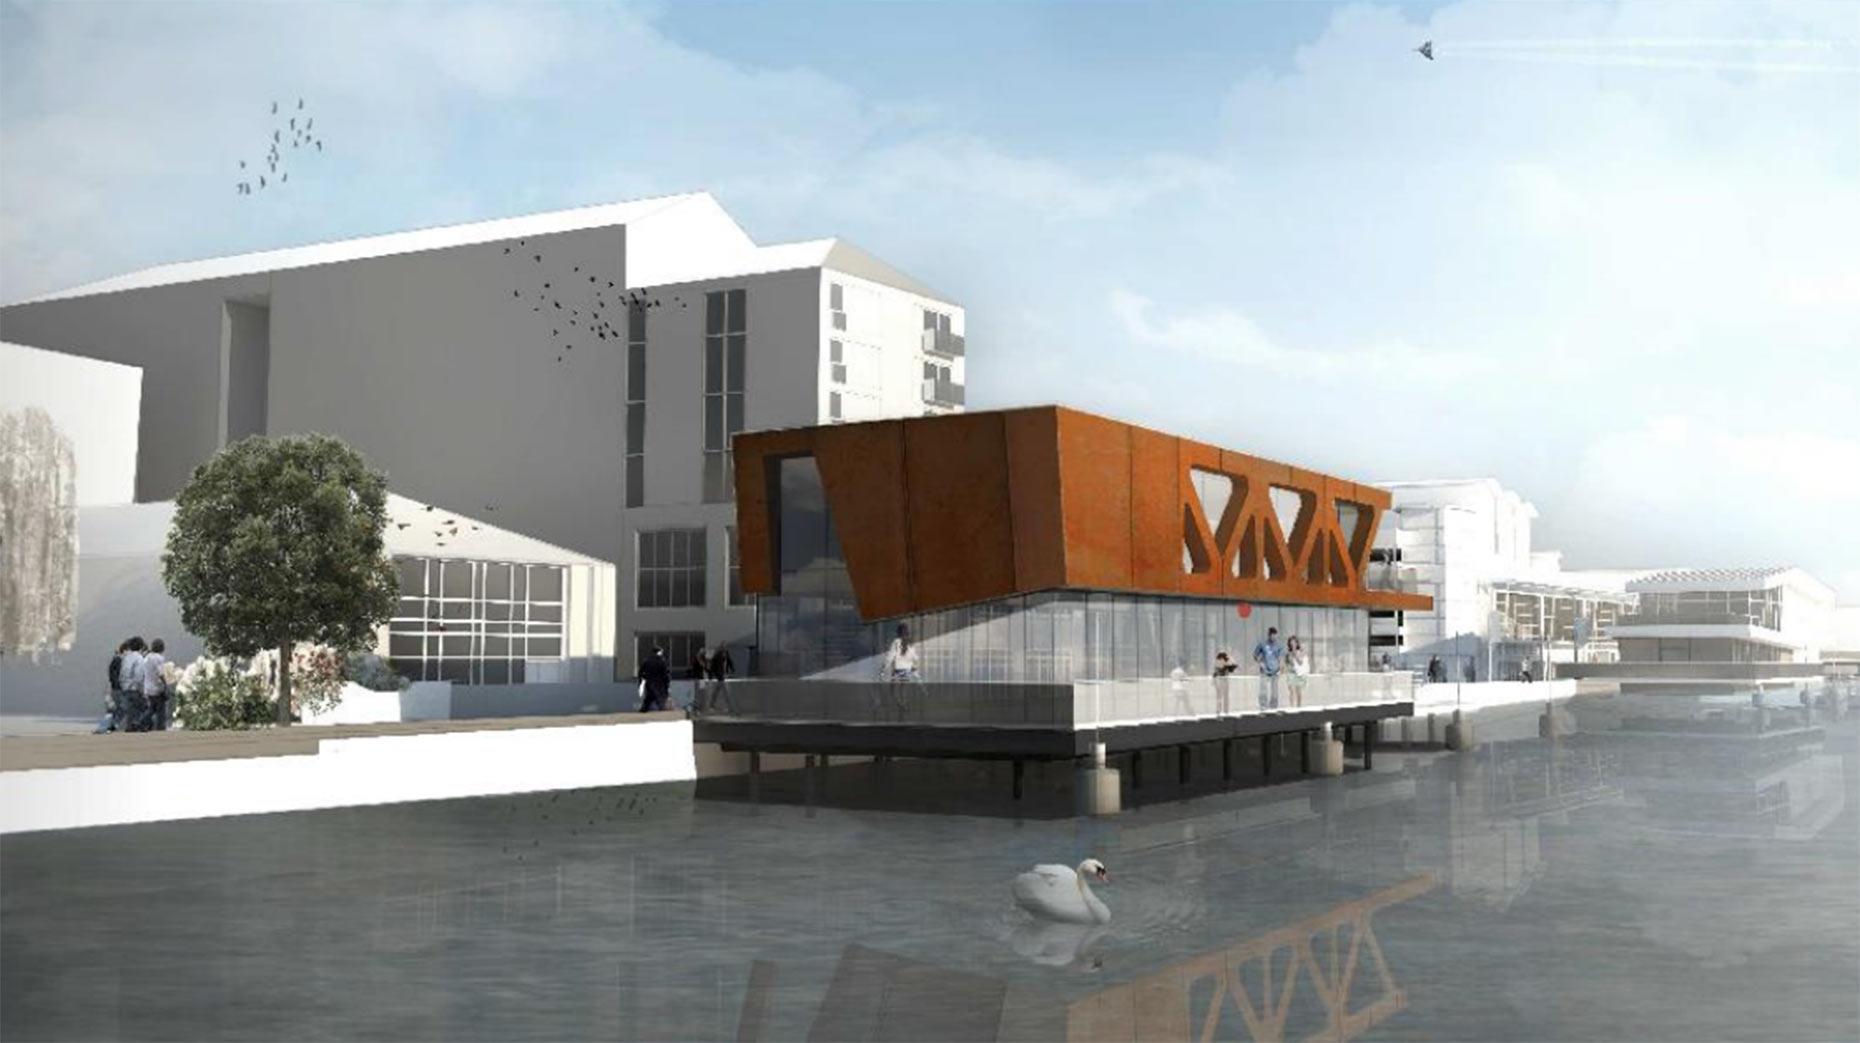 Artist impression by Stem Architects